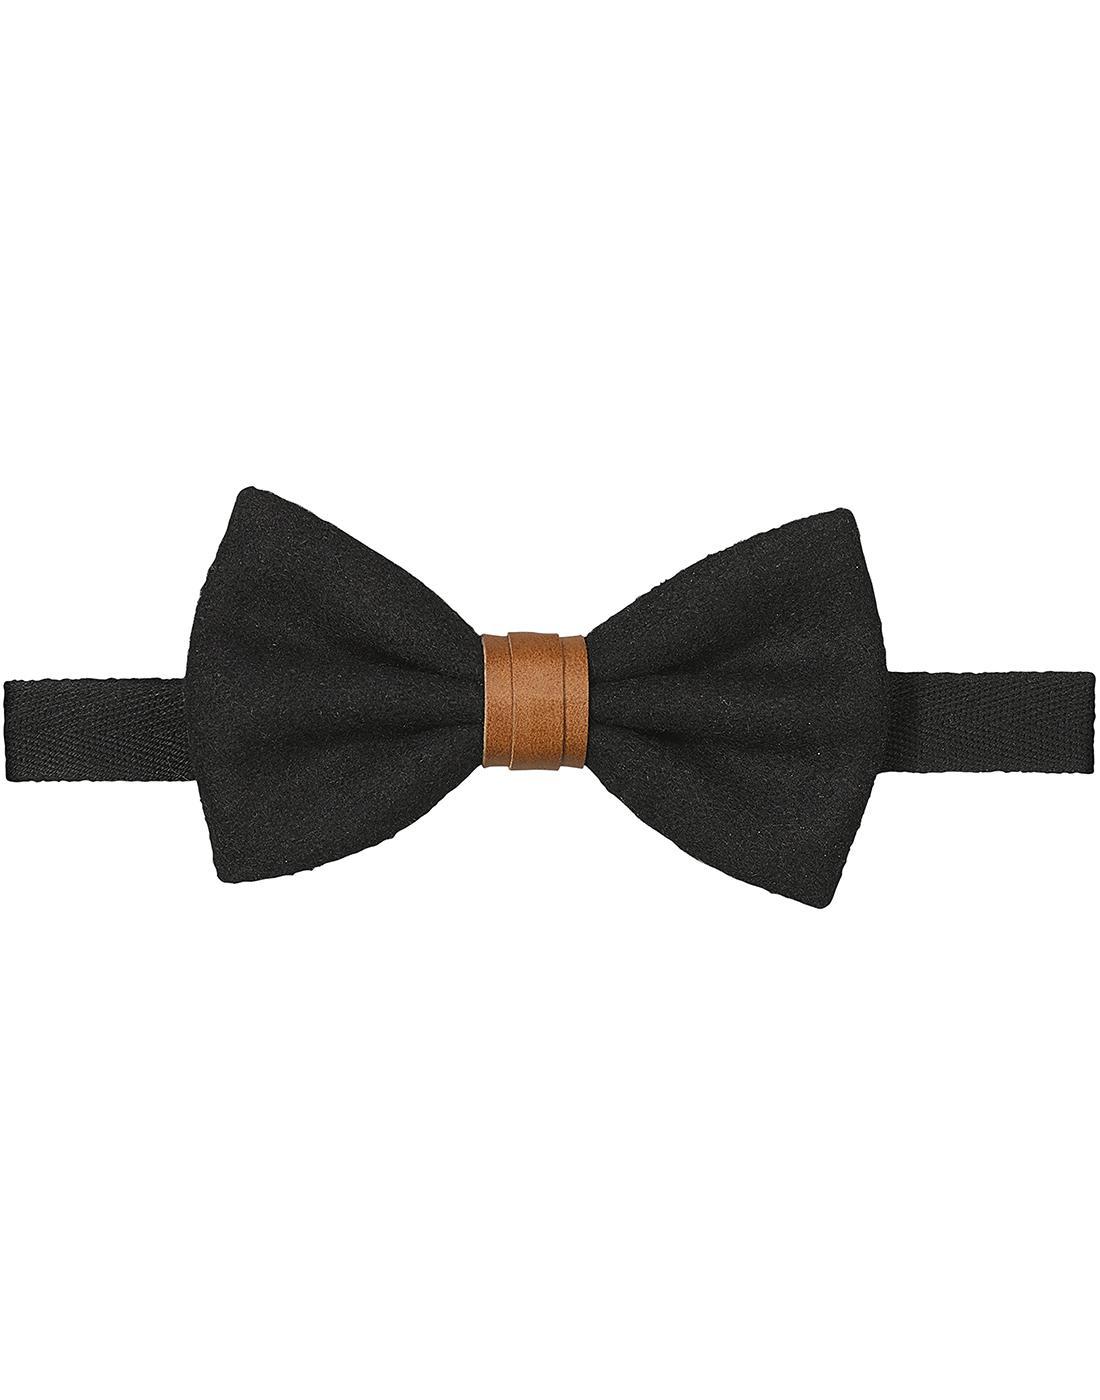 GENTLEMEN'S HARDWARE Vintage Pre-Tied Bow Tie (Bl)